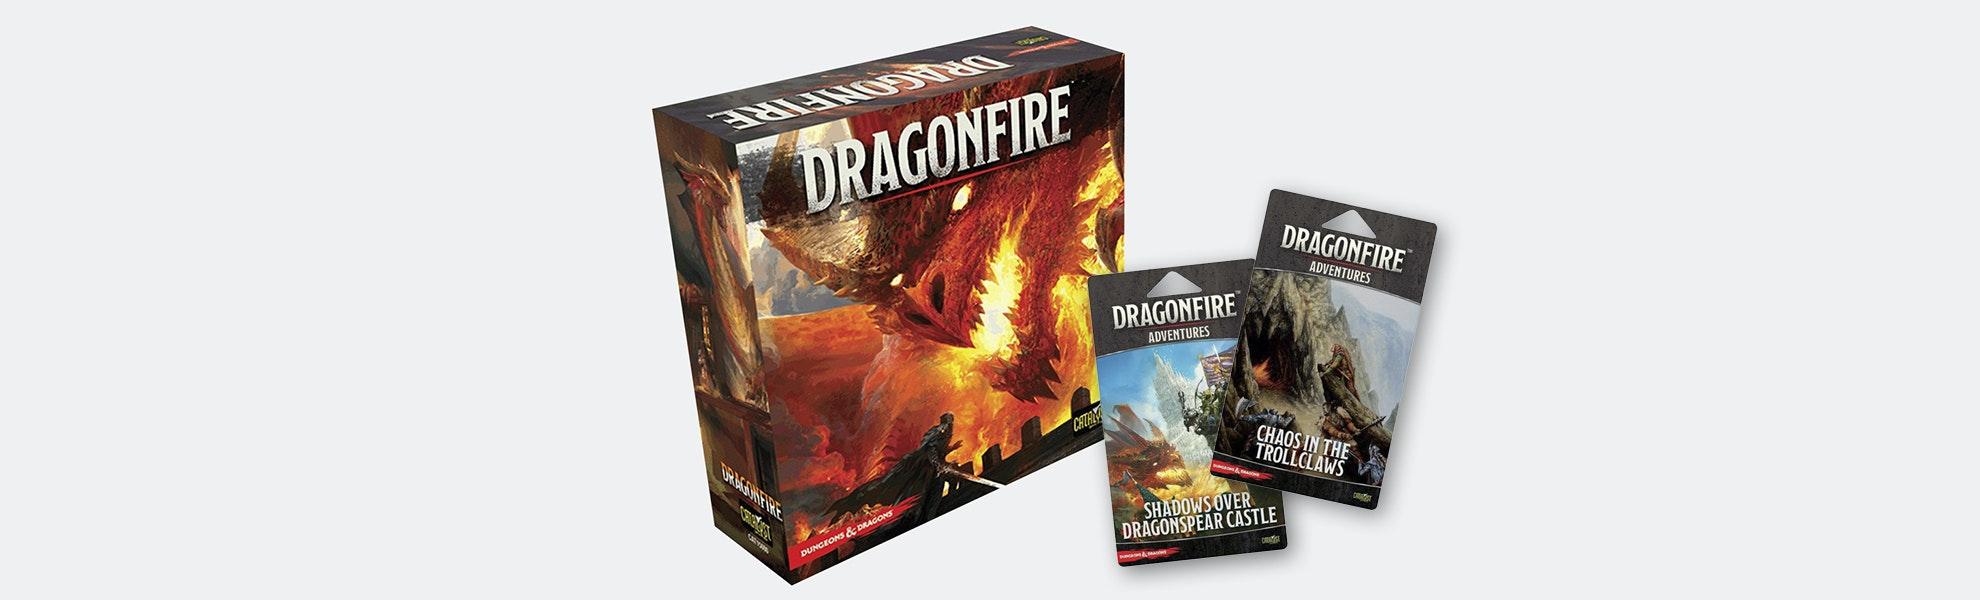 Dragonfire Deck-Building Board Game Bundle 2